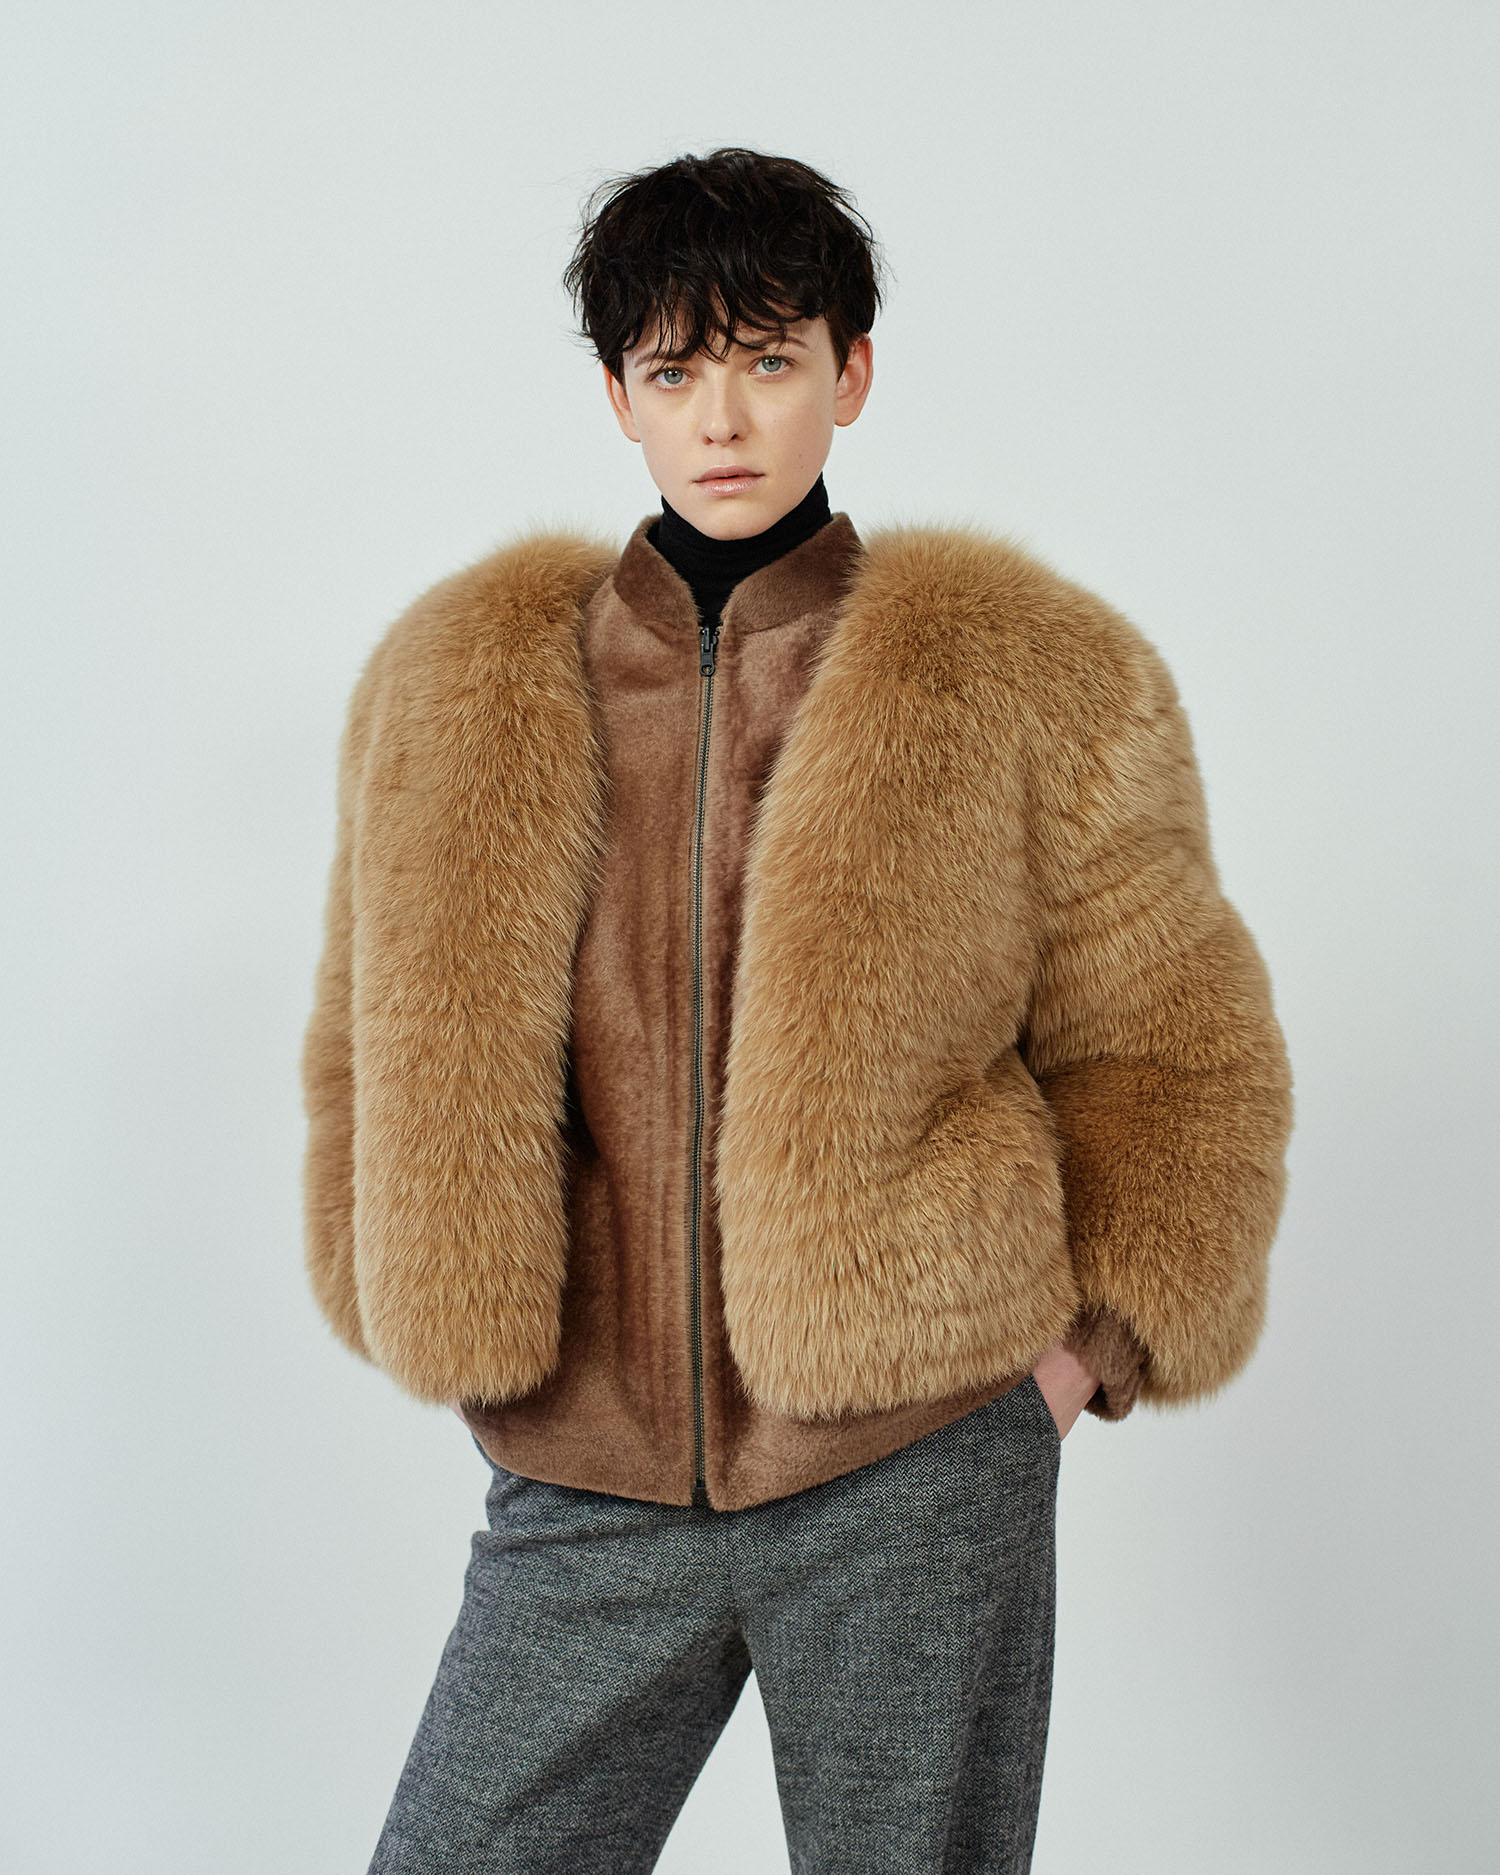 LOU Boléro renard cumin Cumin fox bolero ESJA Veste agneau maicon réversible wood Wood maicon shearling reversible jacket